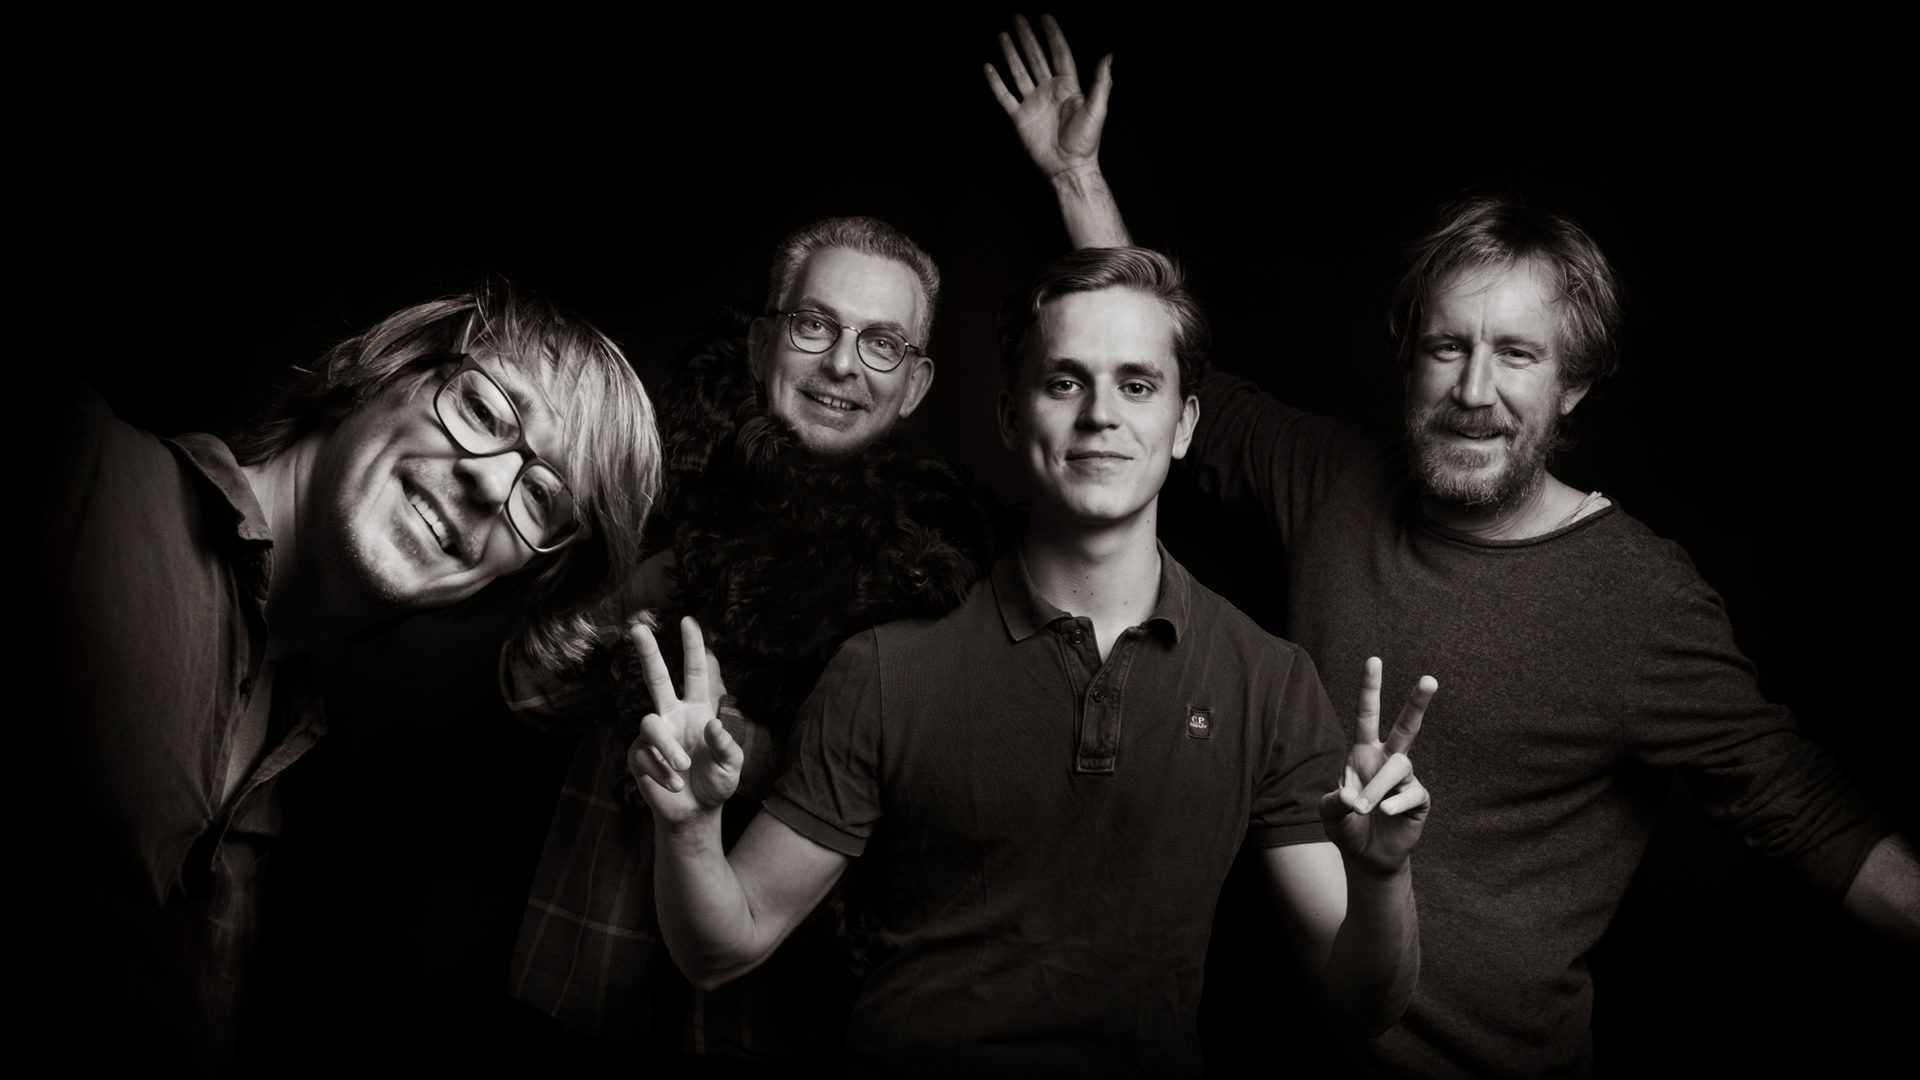 About us at österlen.se. From left Peter Carlsson, Lars Rabe, Noak Karlsson and Christian Esbjörnsson.